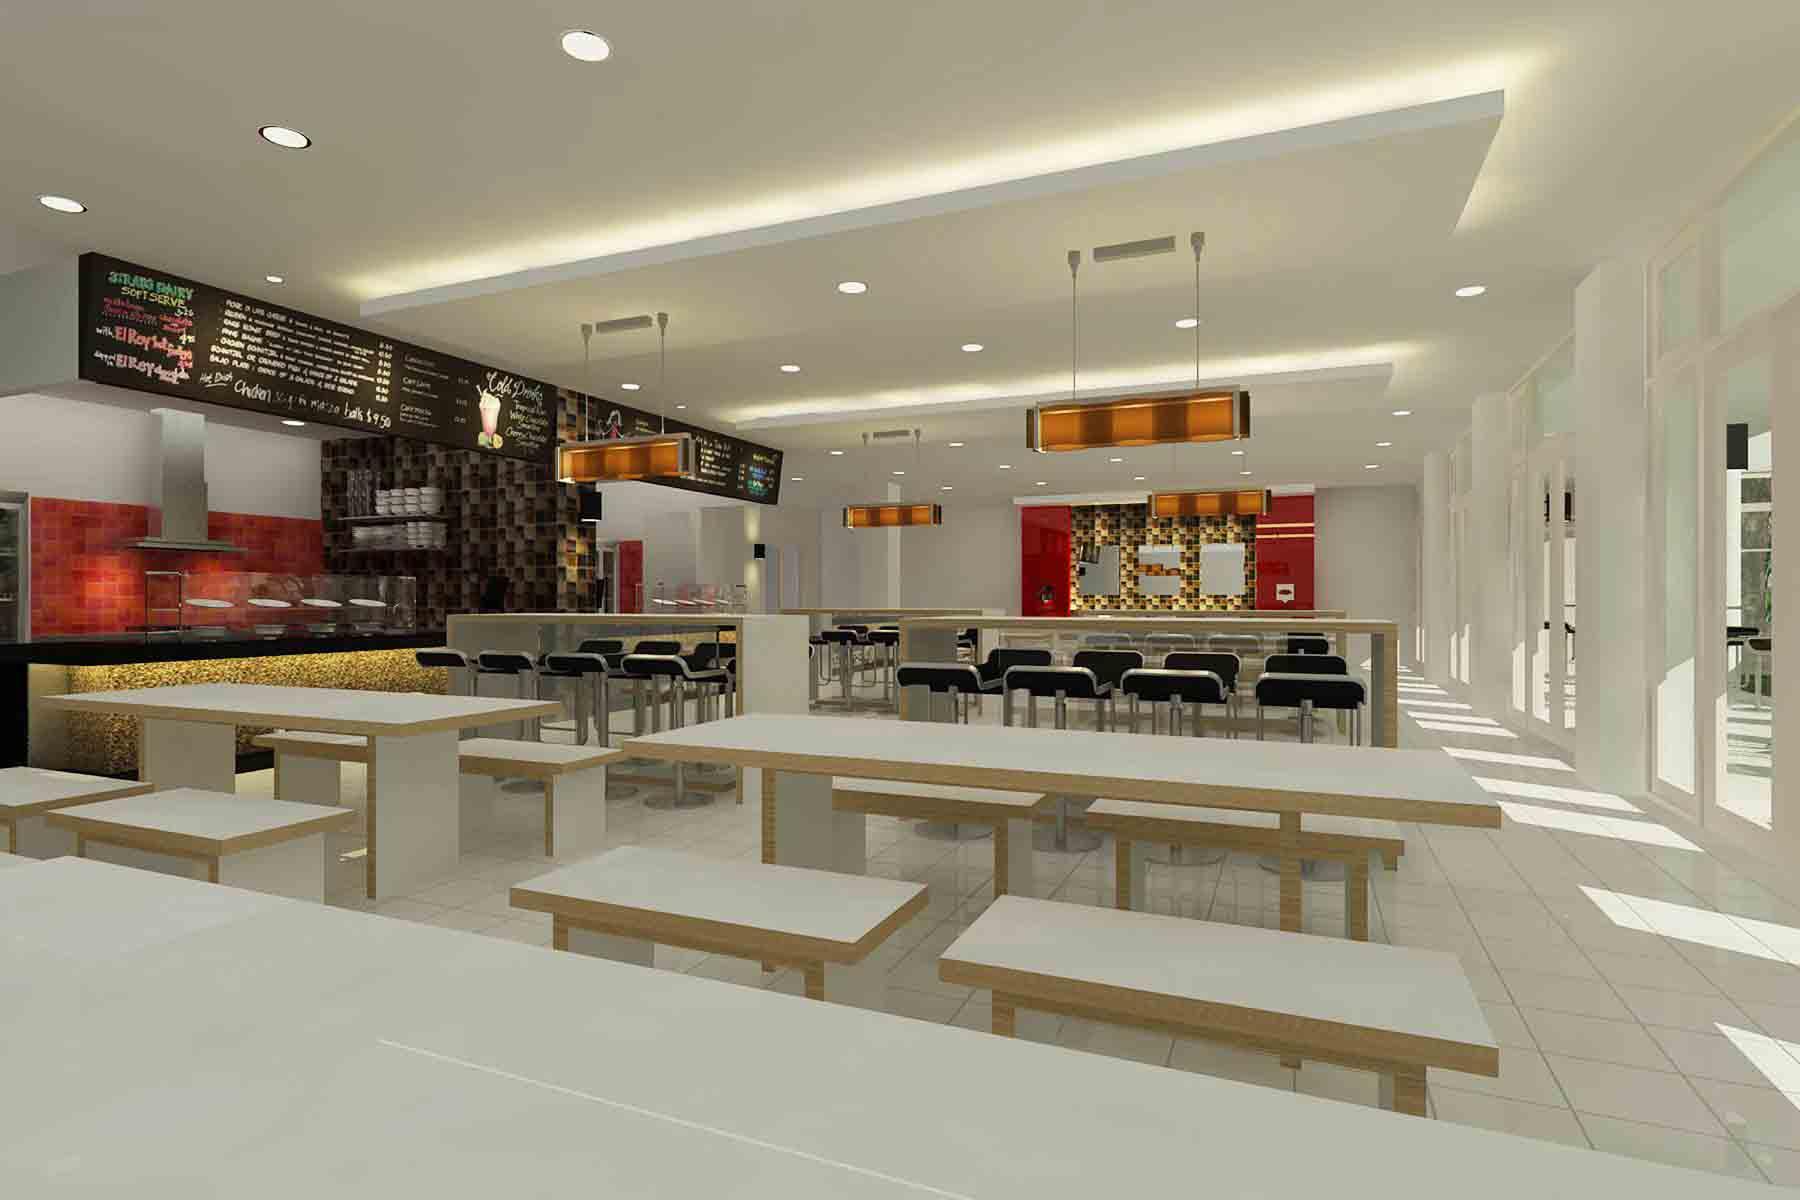 MDC School Design Surabaya by Fesia Prawirya at Coroflotcom